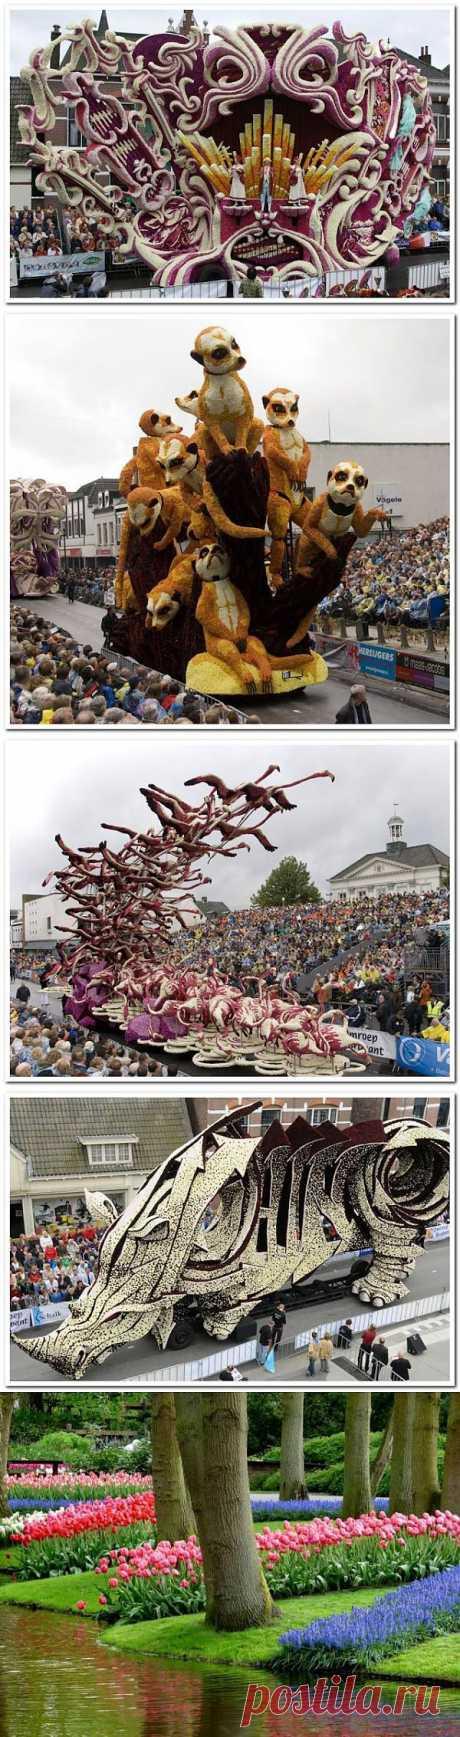 Чудеса света. Парад цветов. Нидерланды - Ярмарка Мастеров - ручная работа, handmade